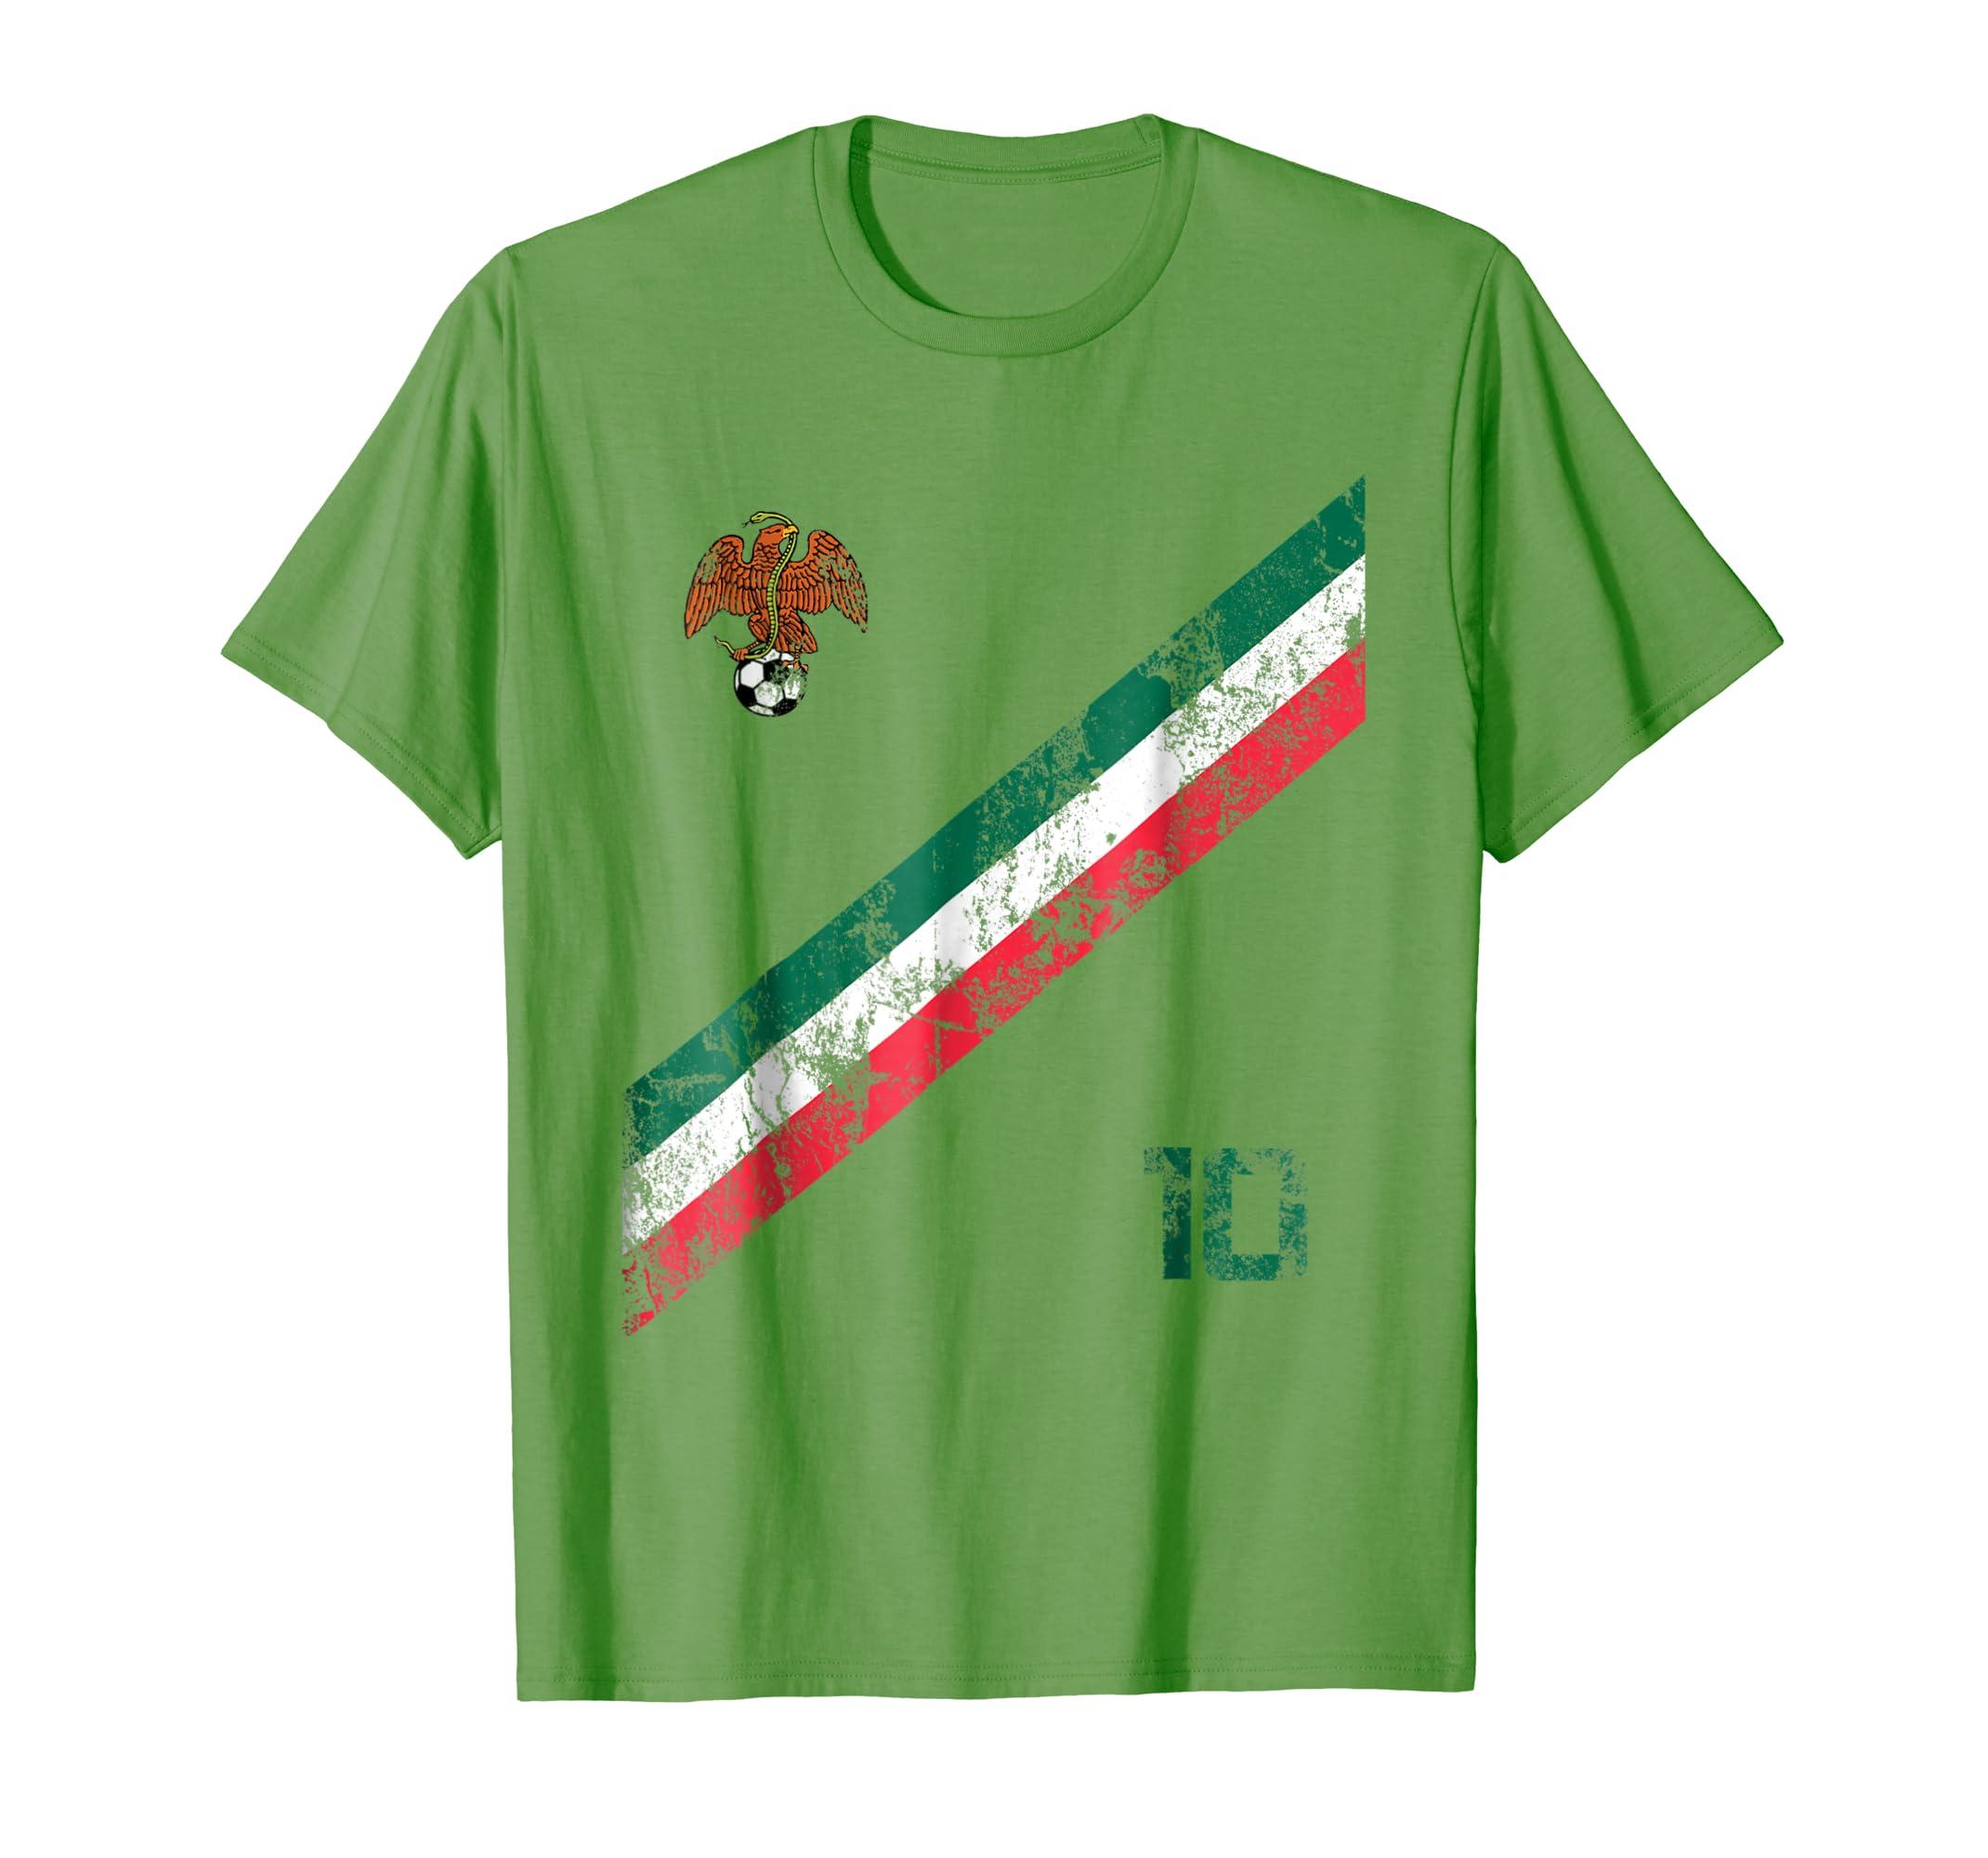 37a54bf69e554 MEXICO SOCCER JERSEY SHIRT WORLD AZTEC FLAG-Teechatpro